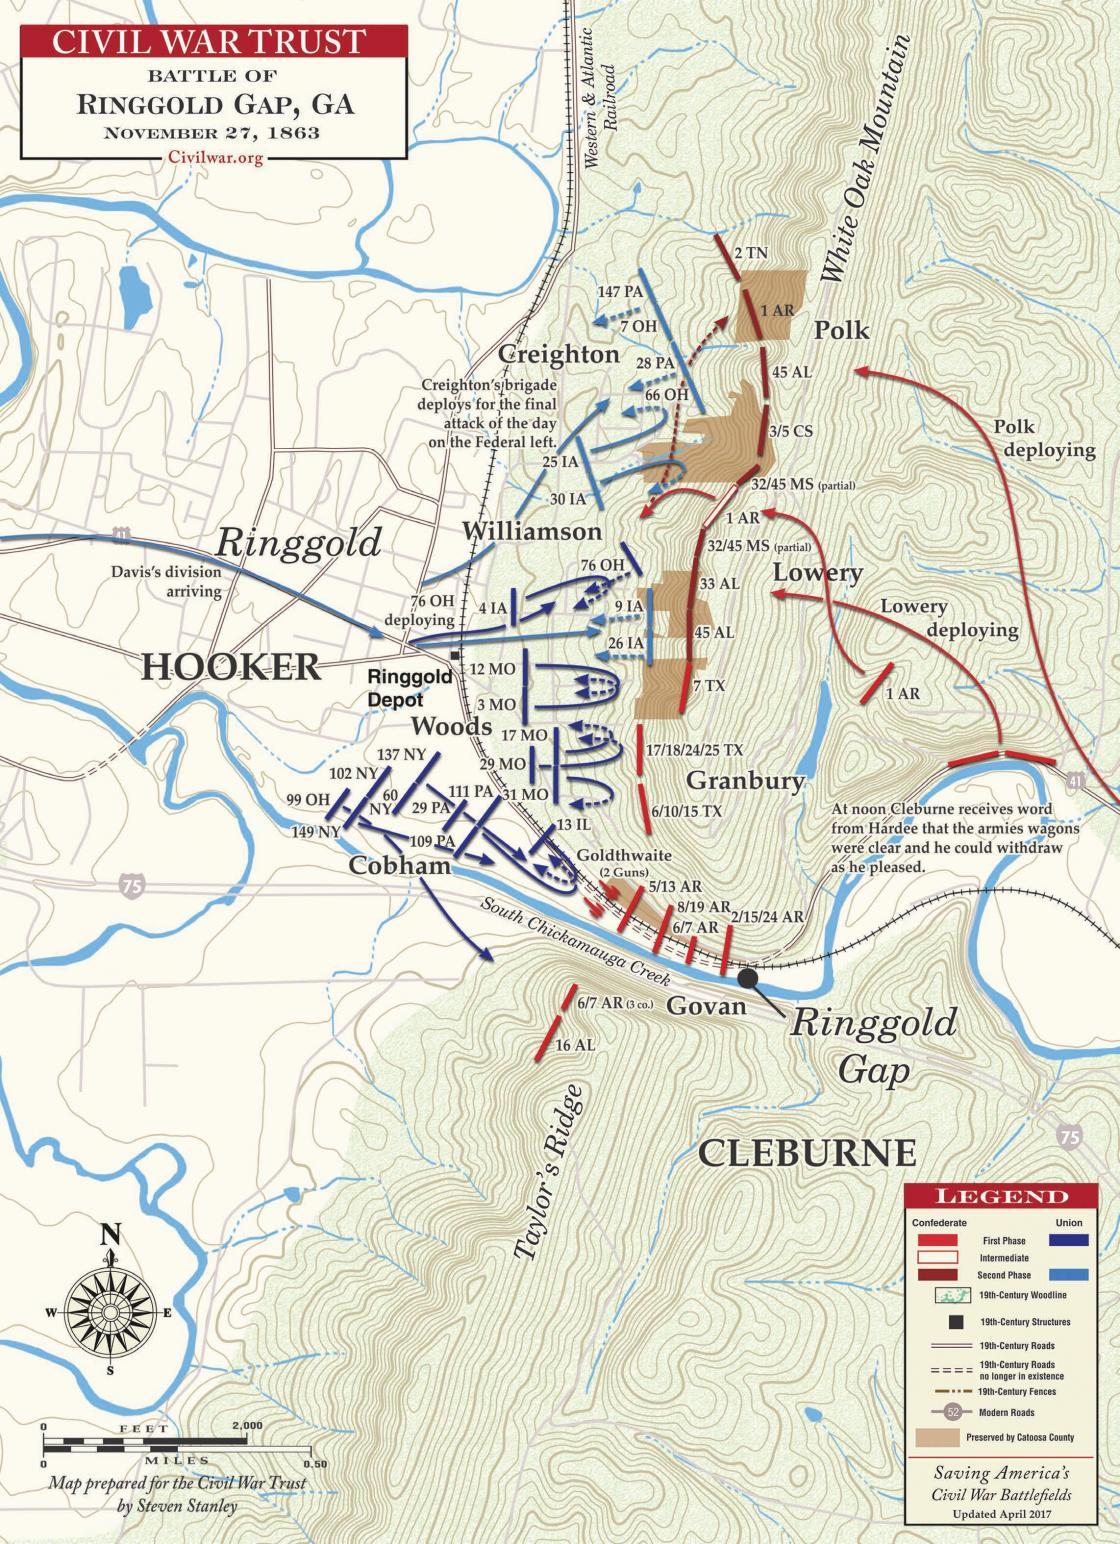 Battle of Ringgold Gap - November 27, 1863